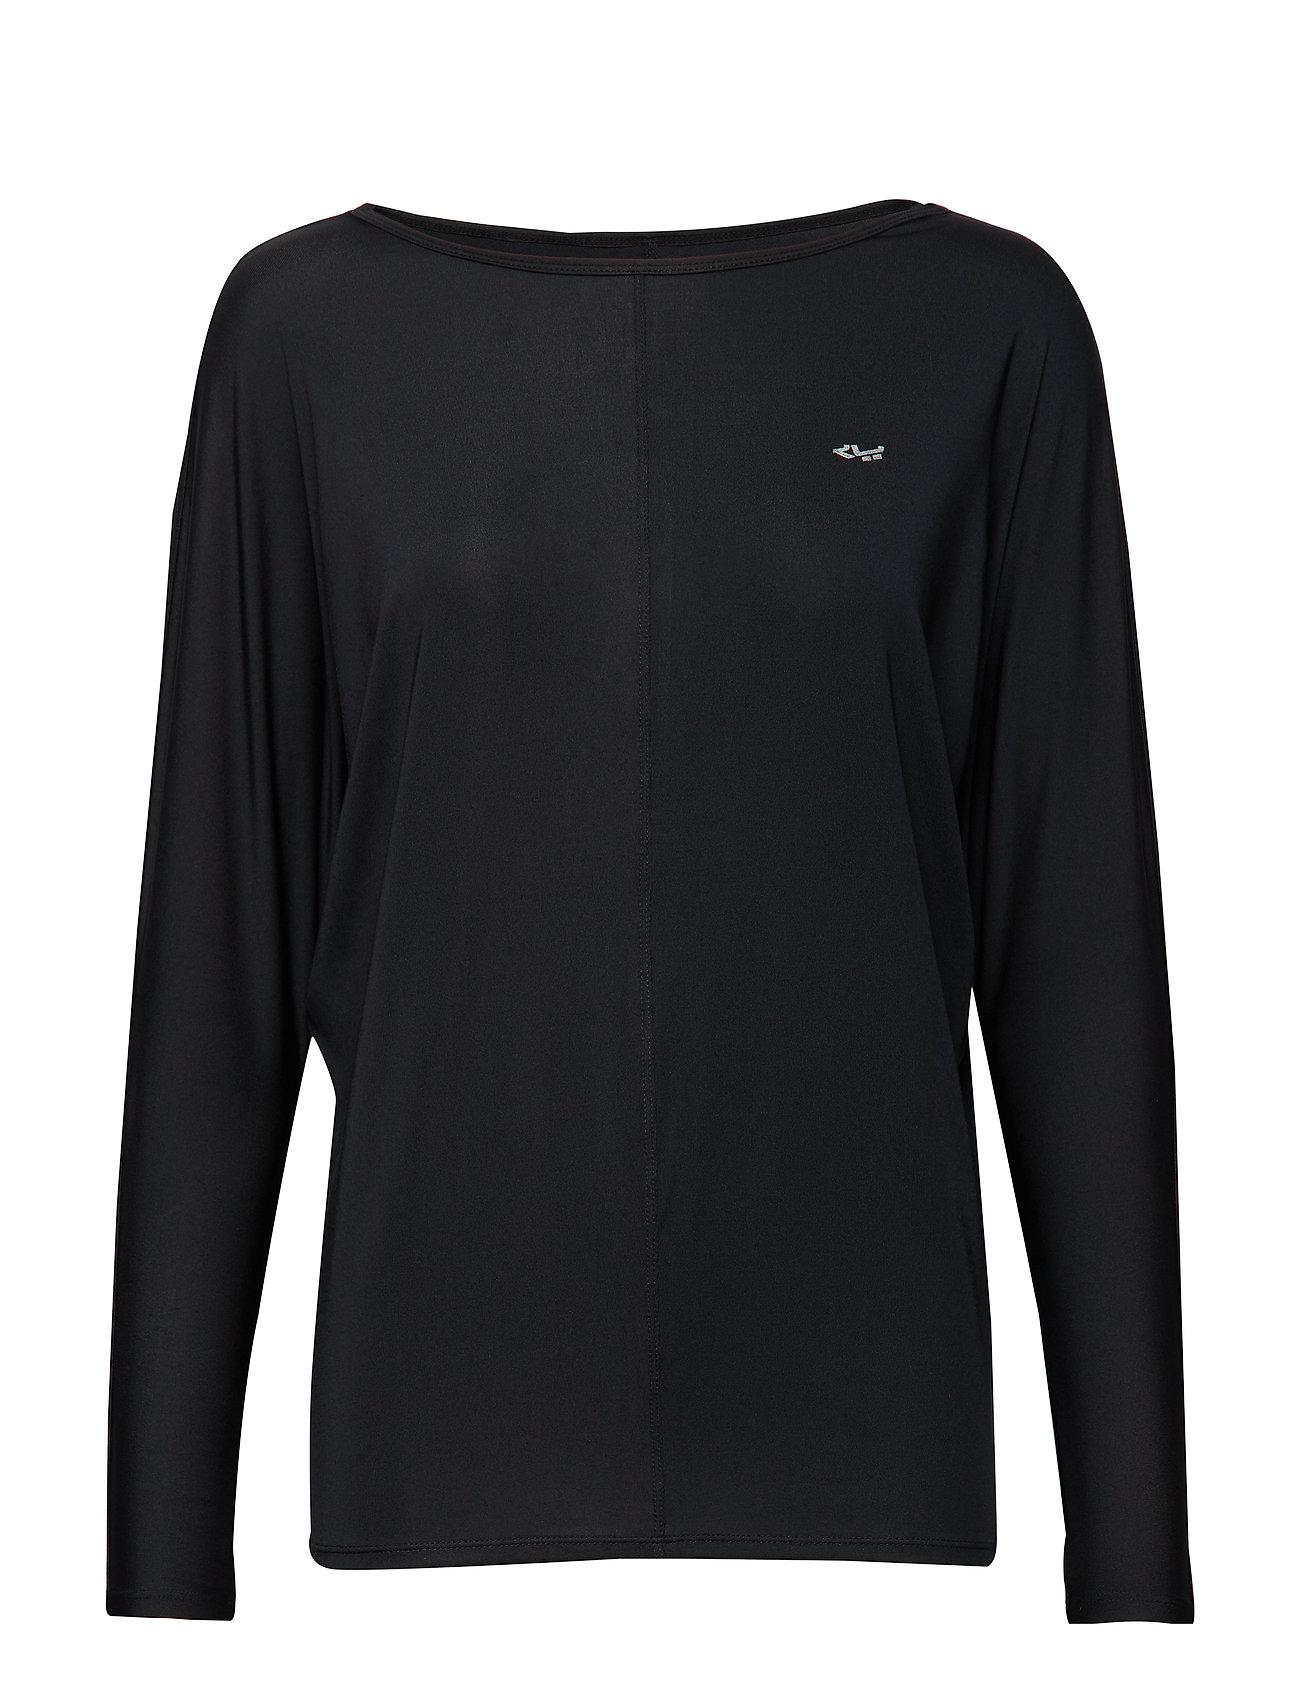 Röhnisch Drape Top - BLACK